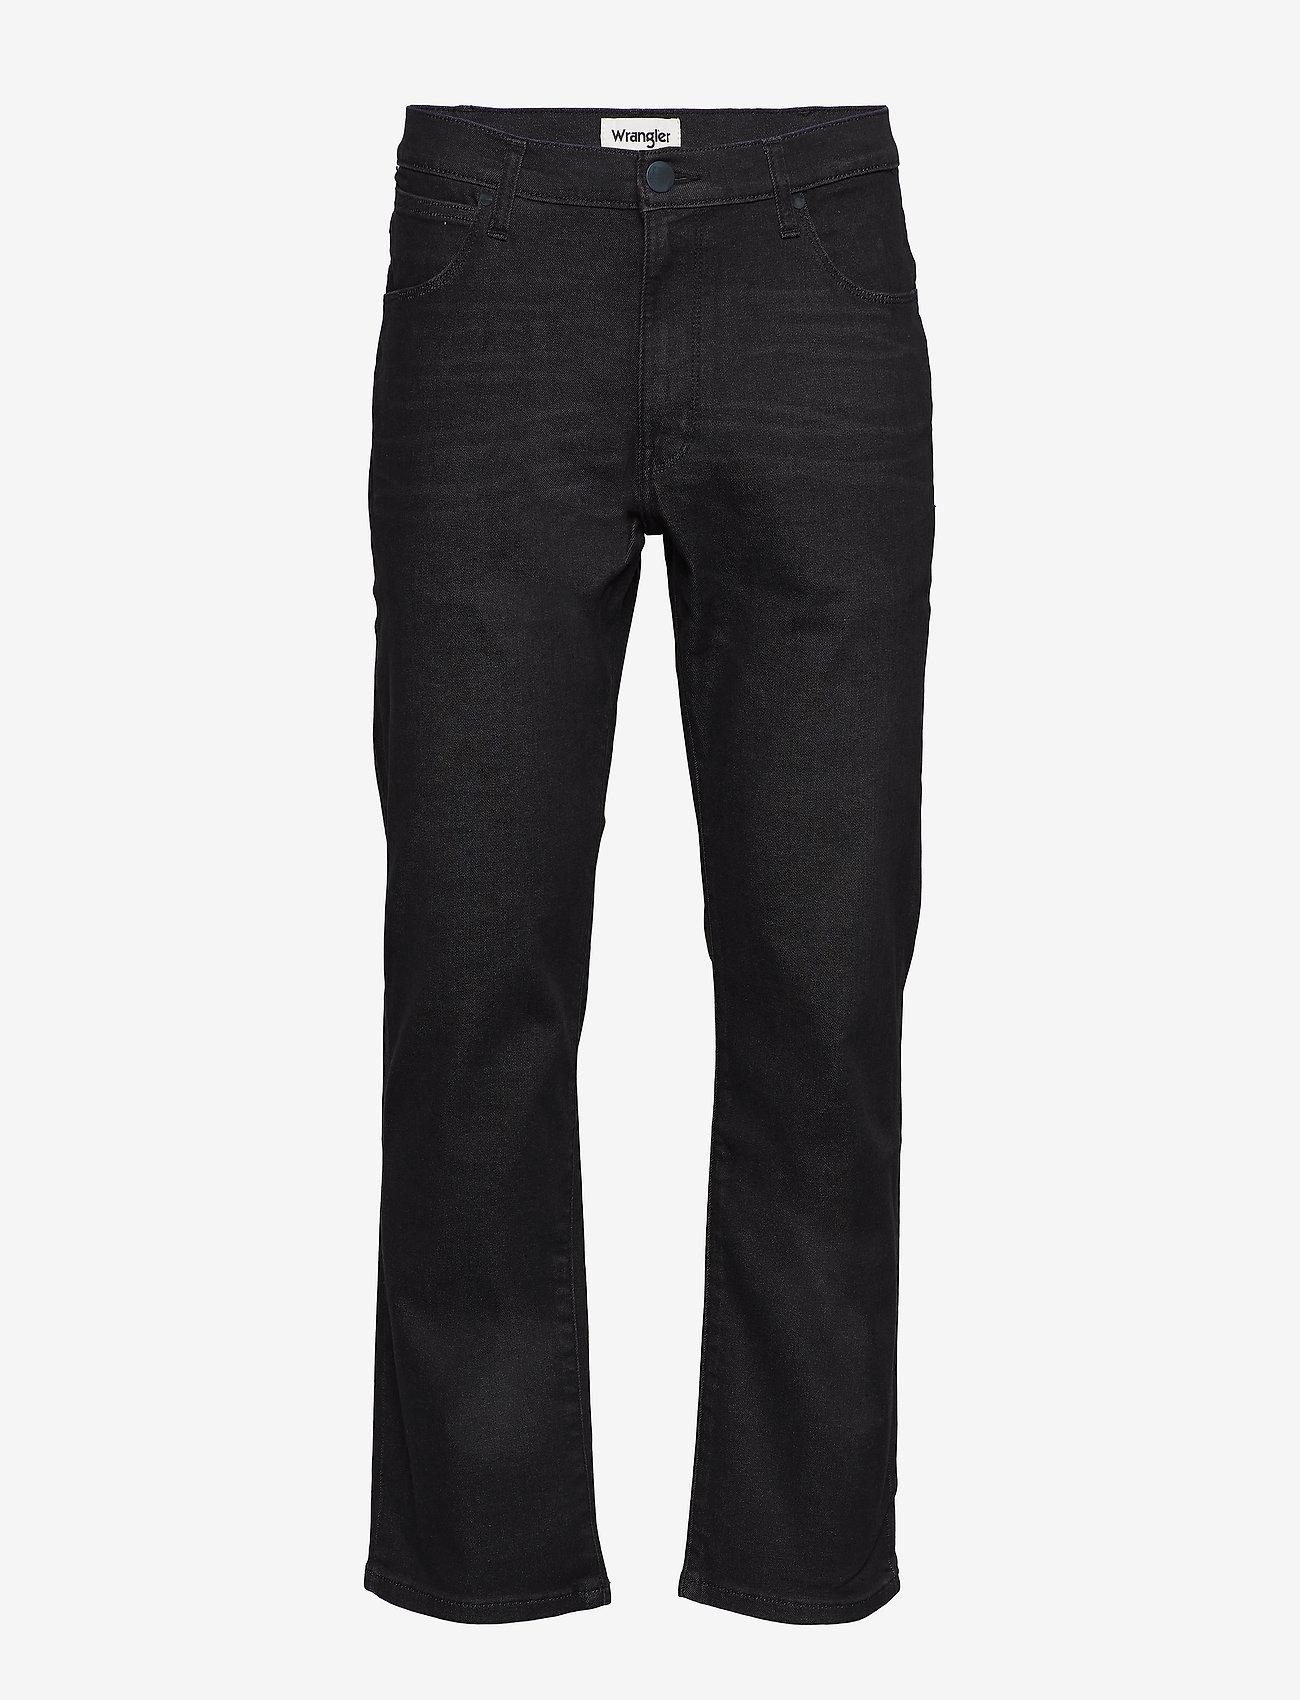 Wrangler - ARIZONA - regular jeans - black space